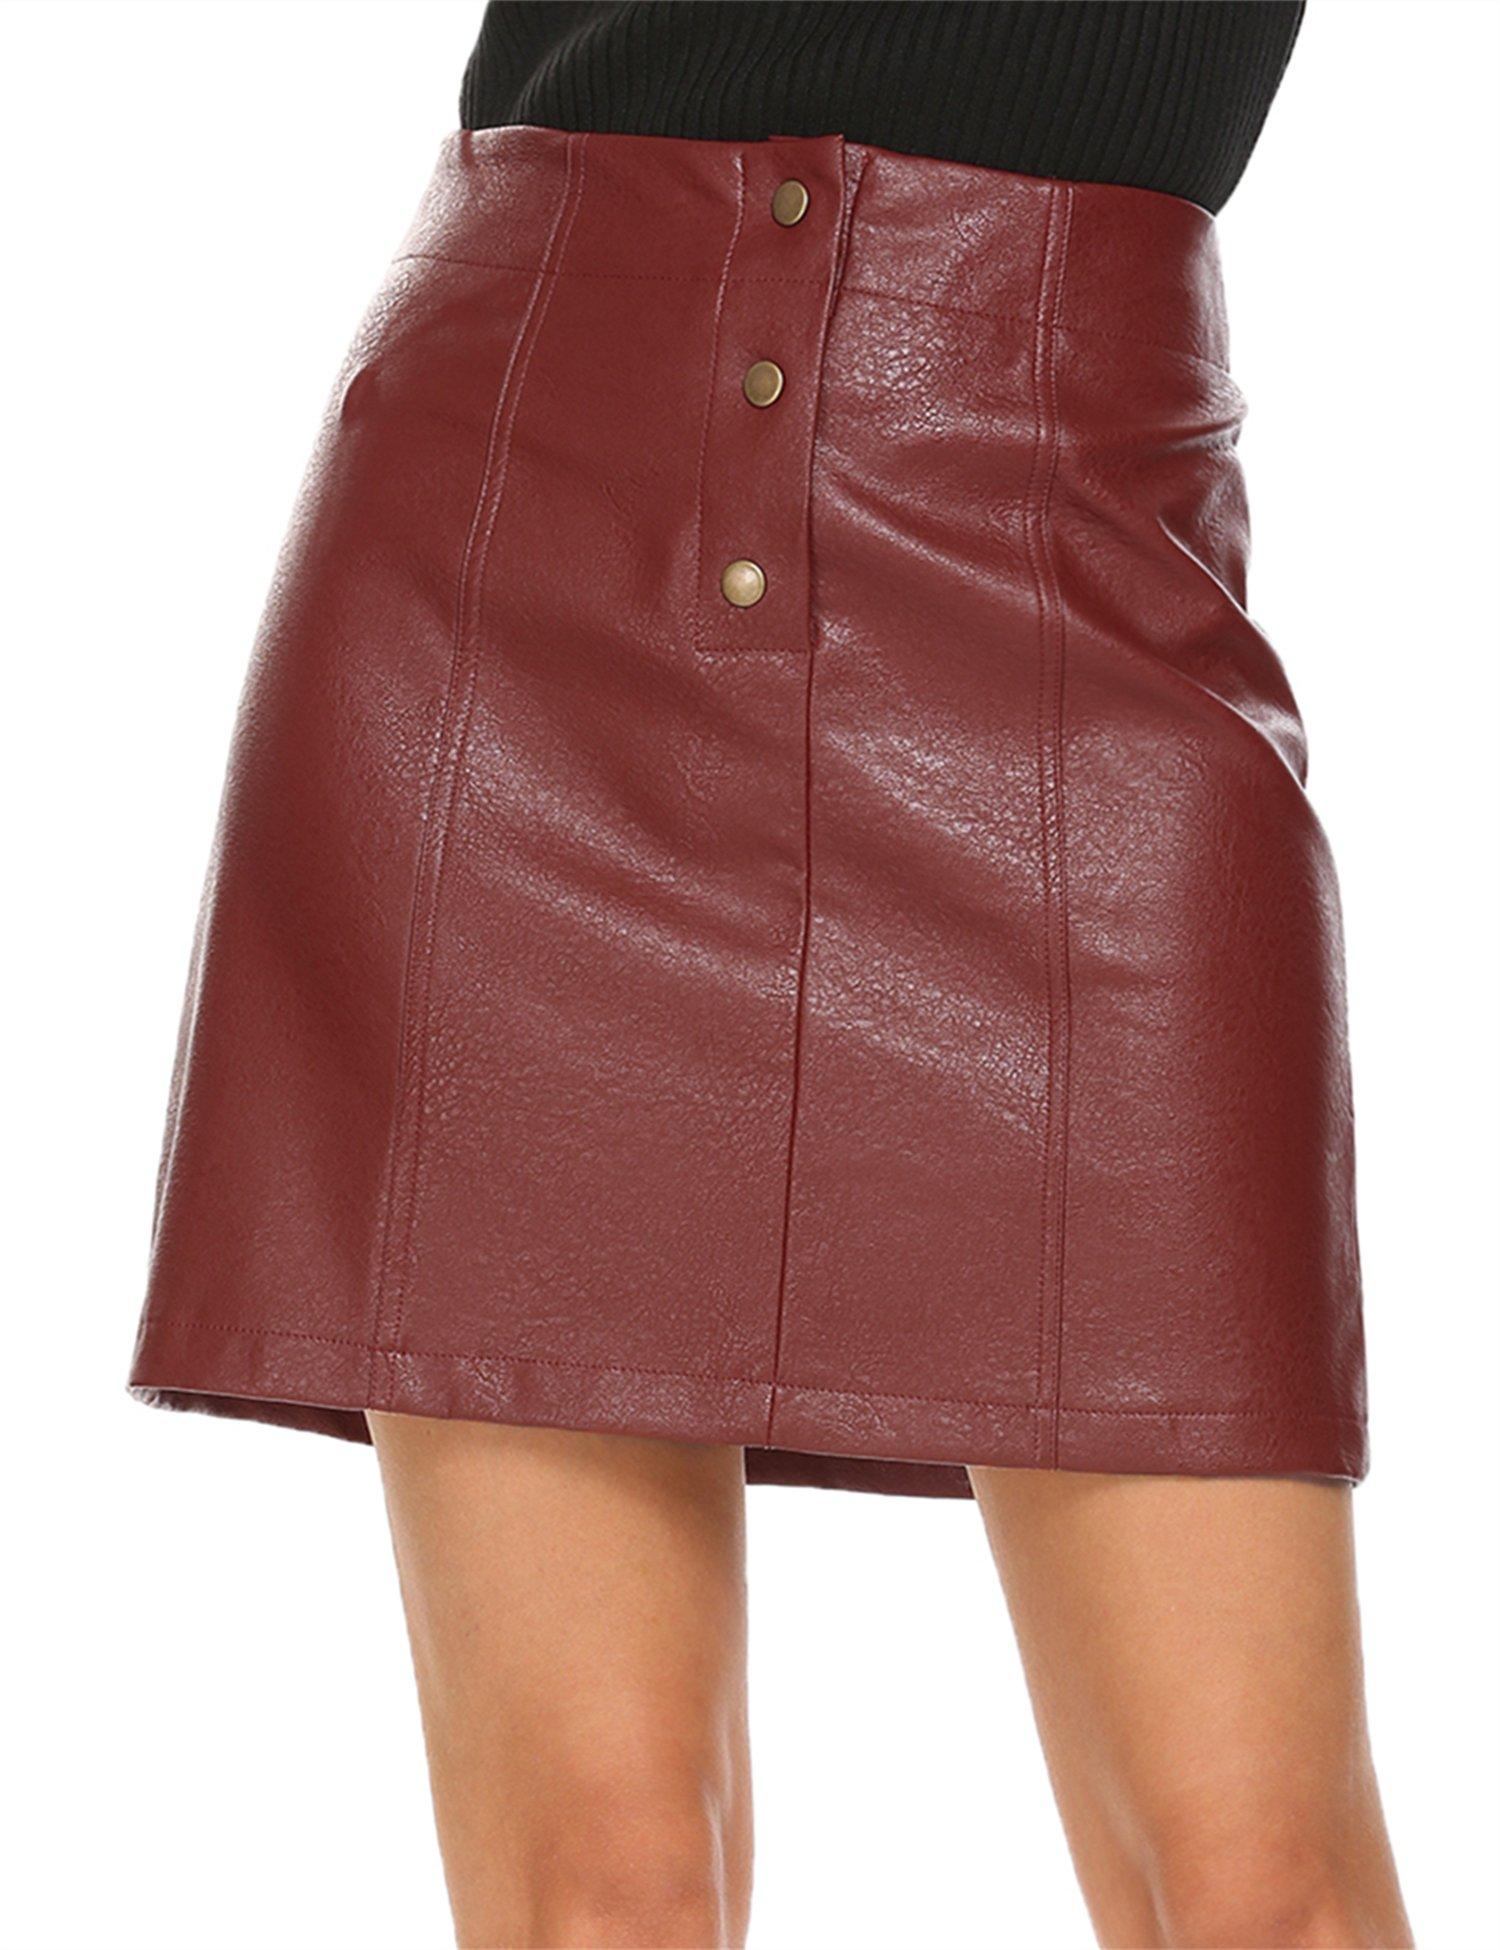 Mofavor Women's Faux Leather Skirts High Waist Button Front A Line Short Mini Skirt